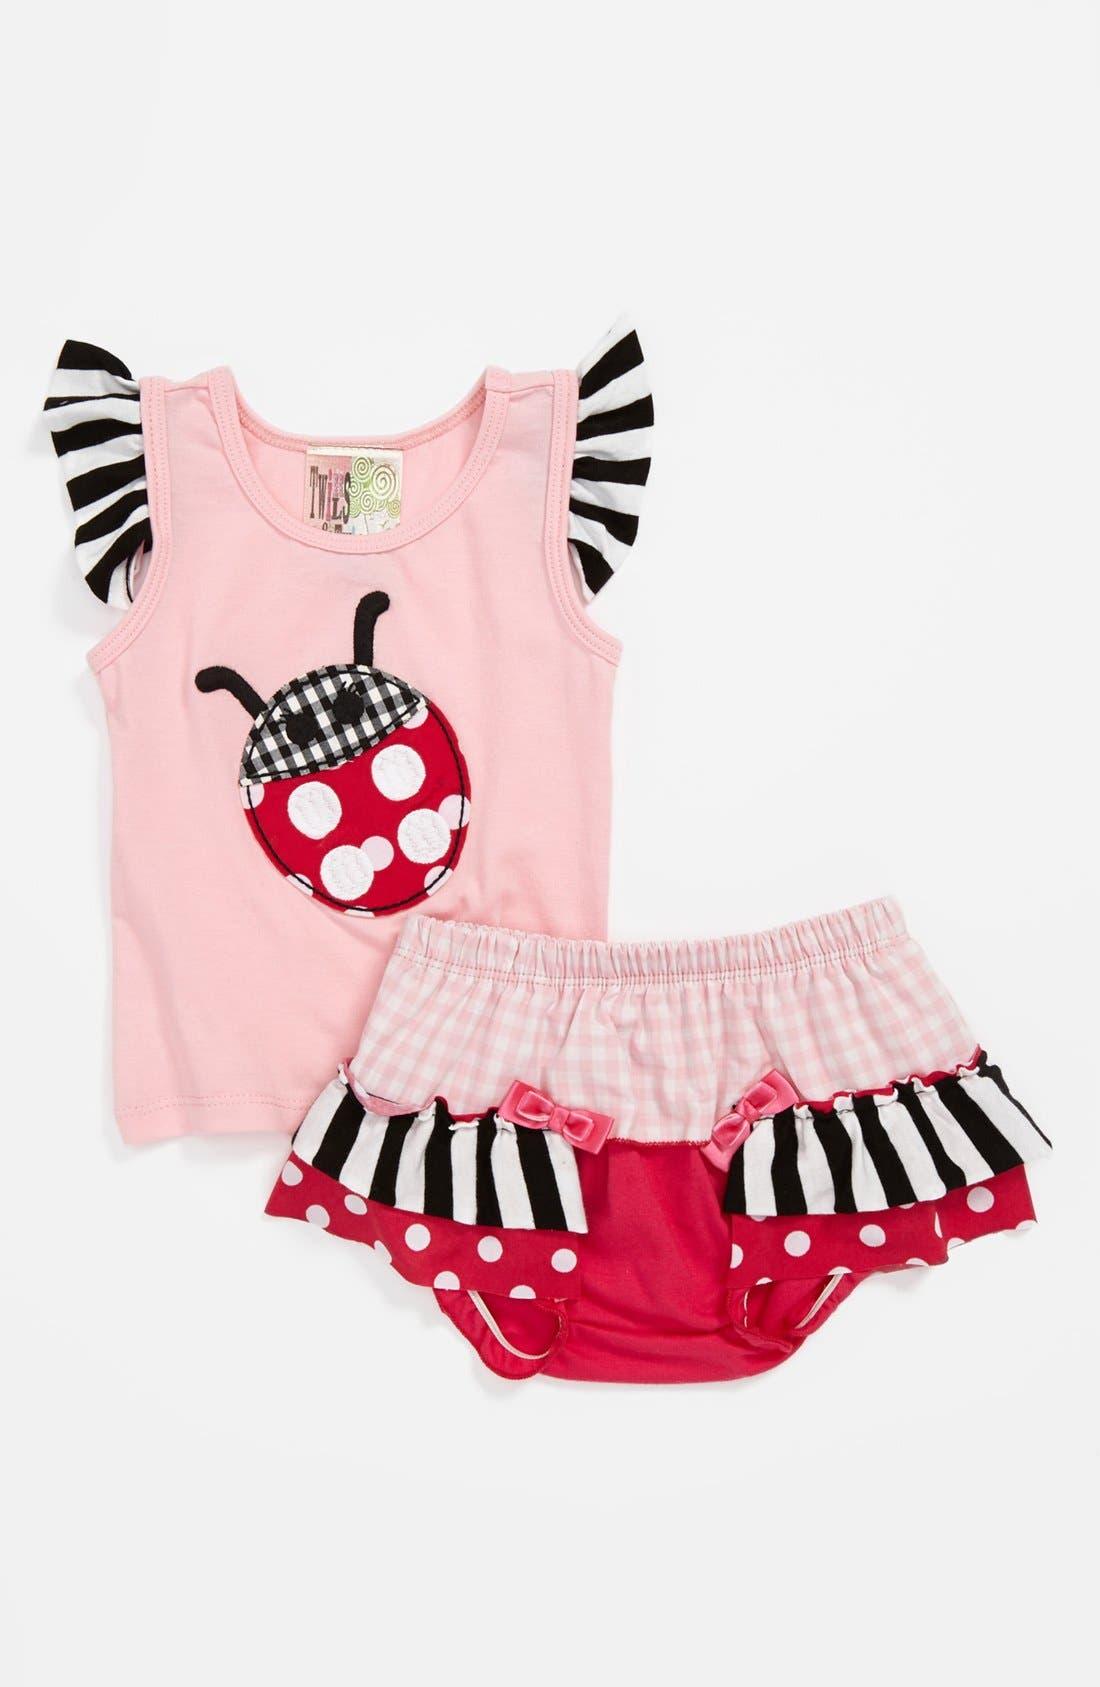 Main Image - Twirls & Twigs 'Ladybug' Top & Bloomers (Baby Girls)